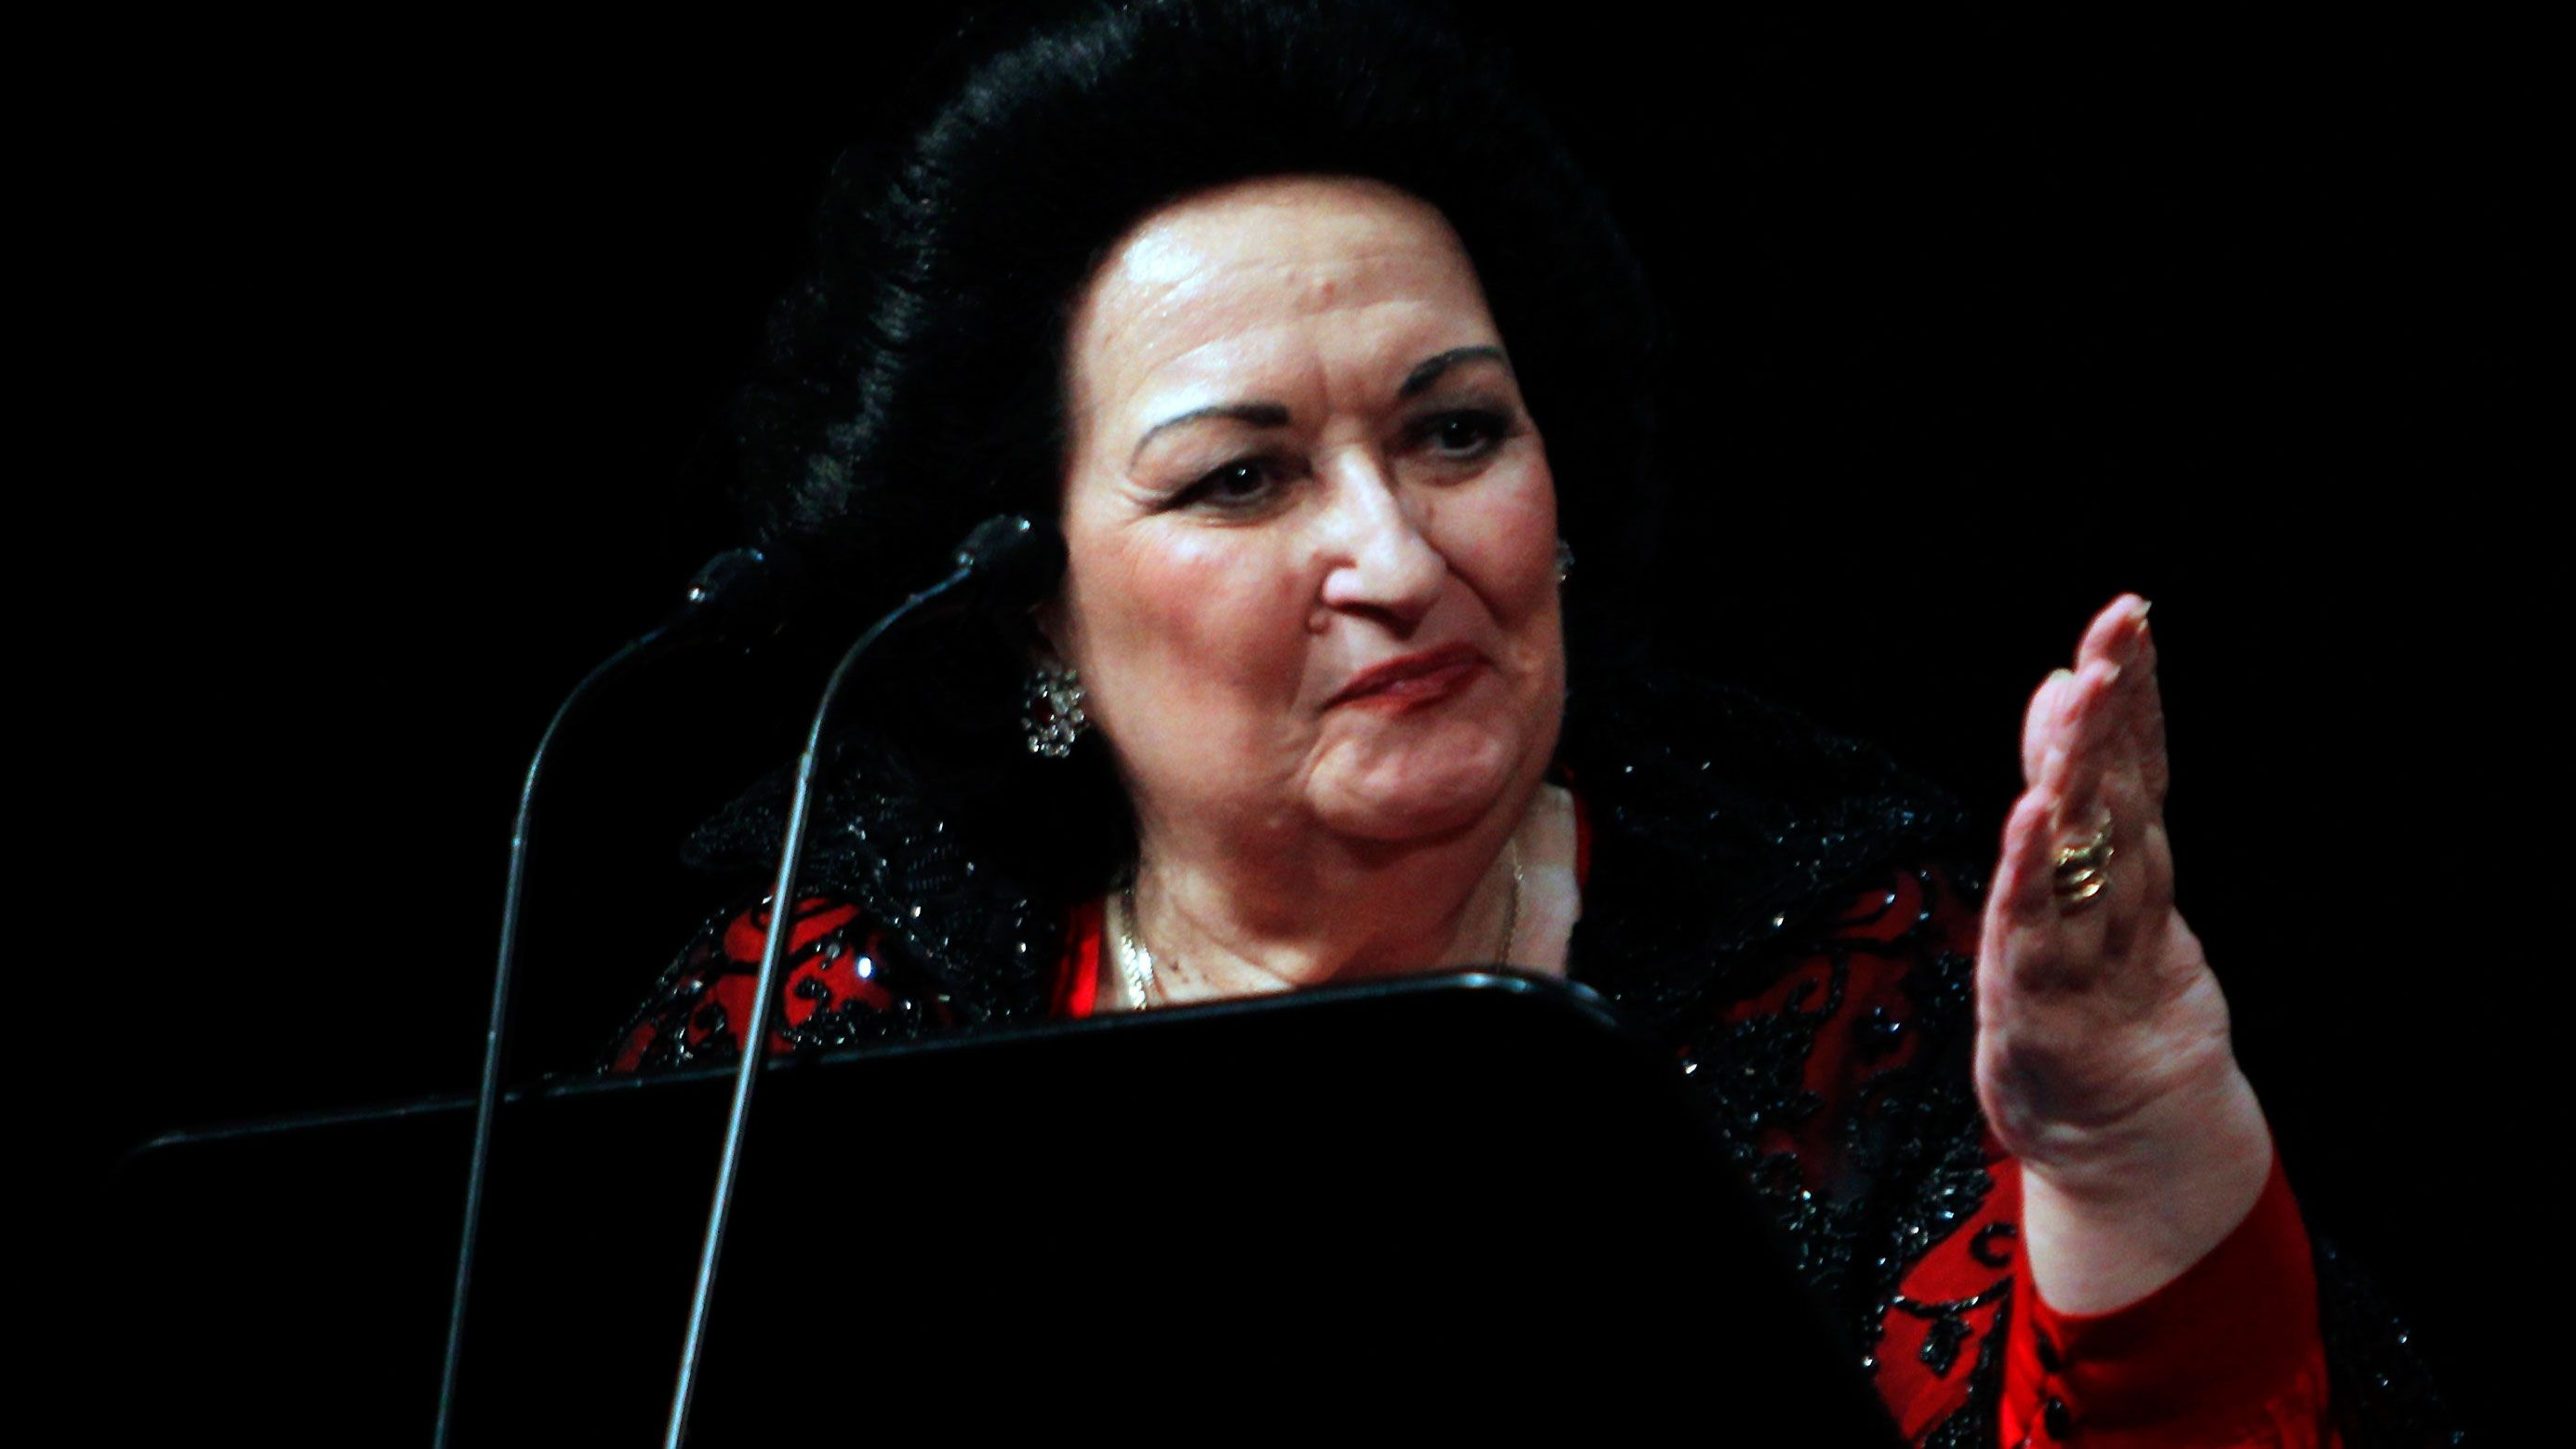 Monserrat Caballé condannata per frode fiscale